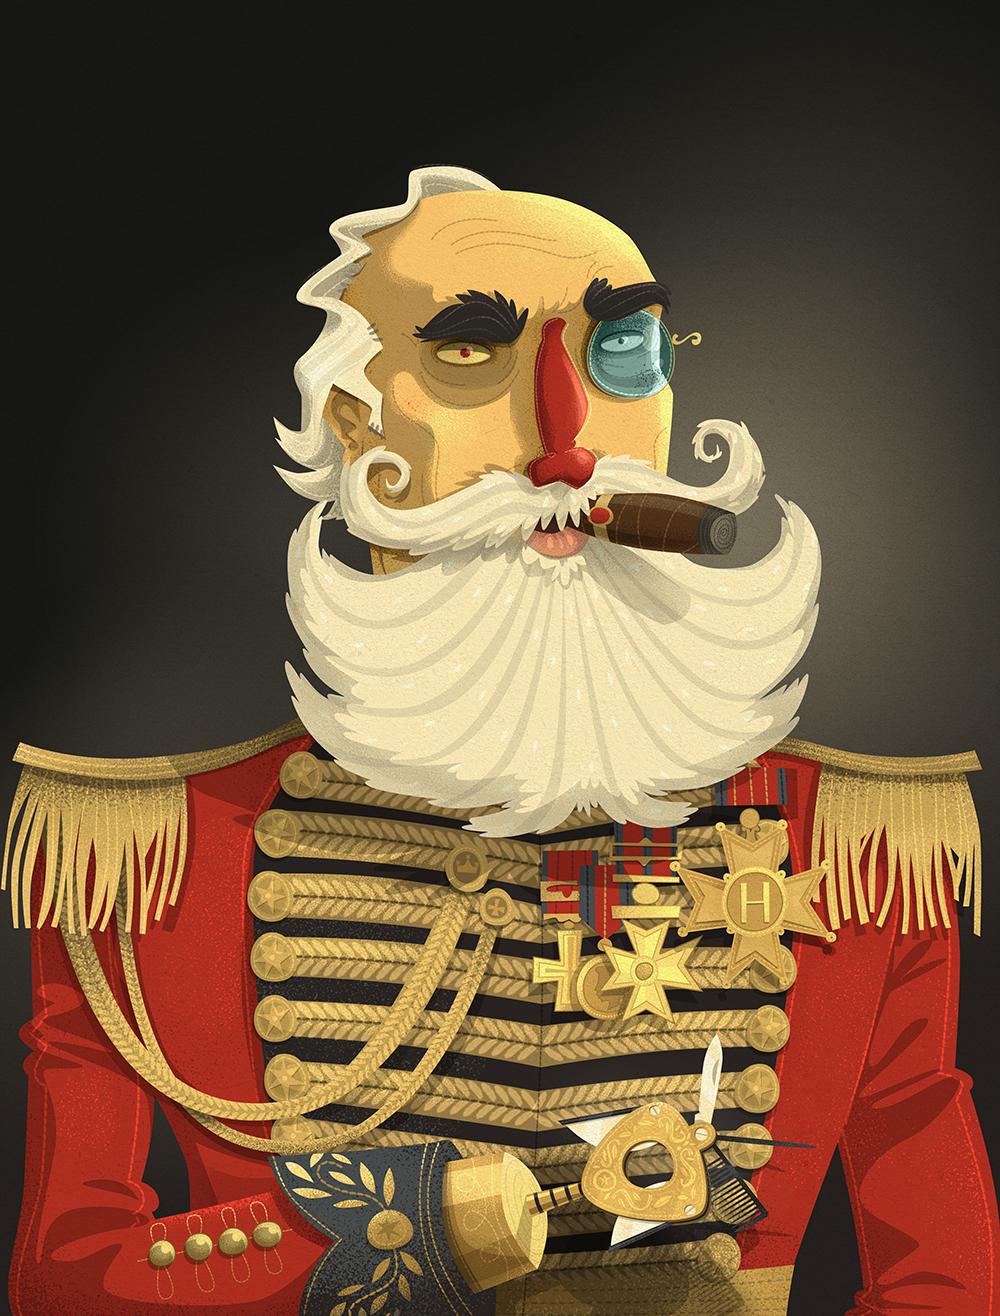 cigar_characters_steve_simpson_cigarmonkeys_2.jpg